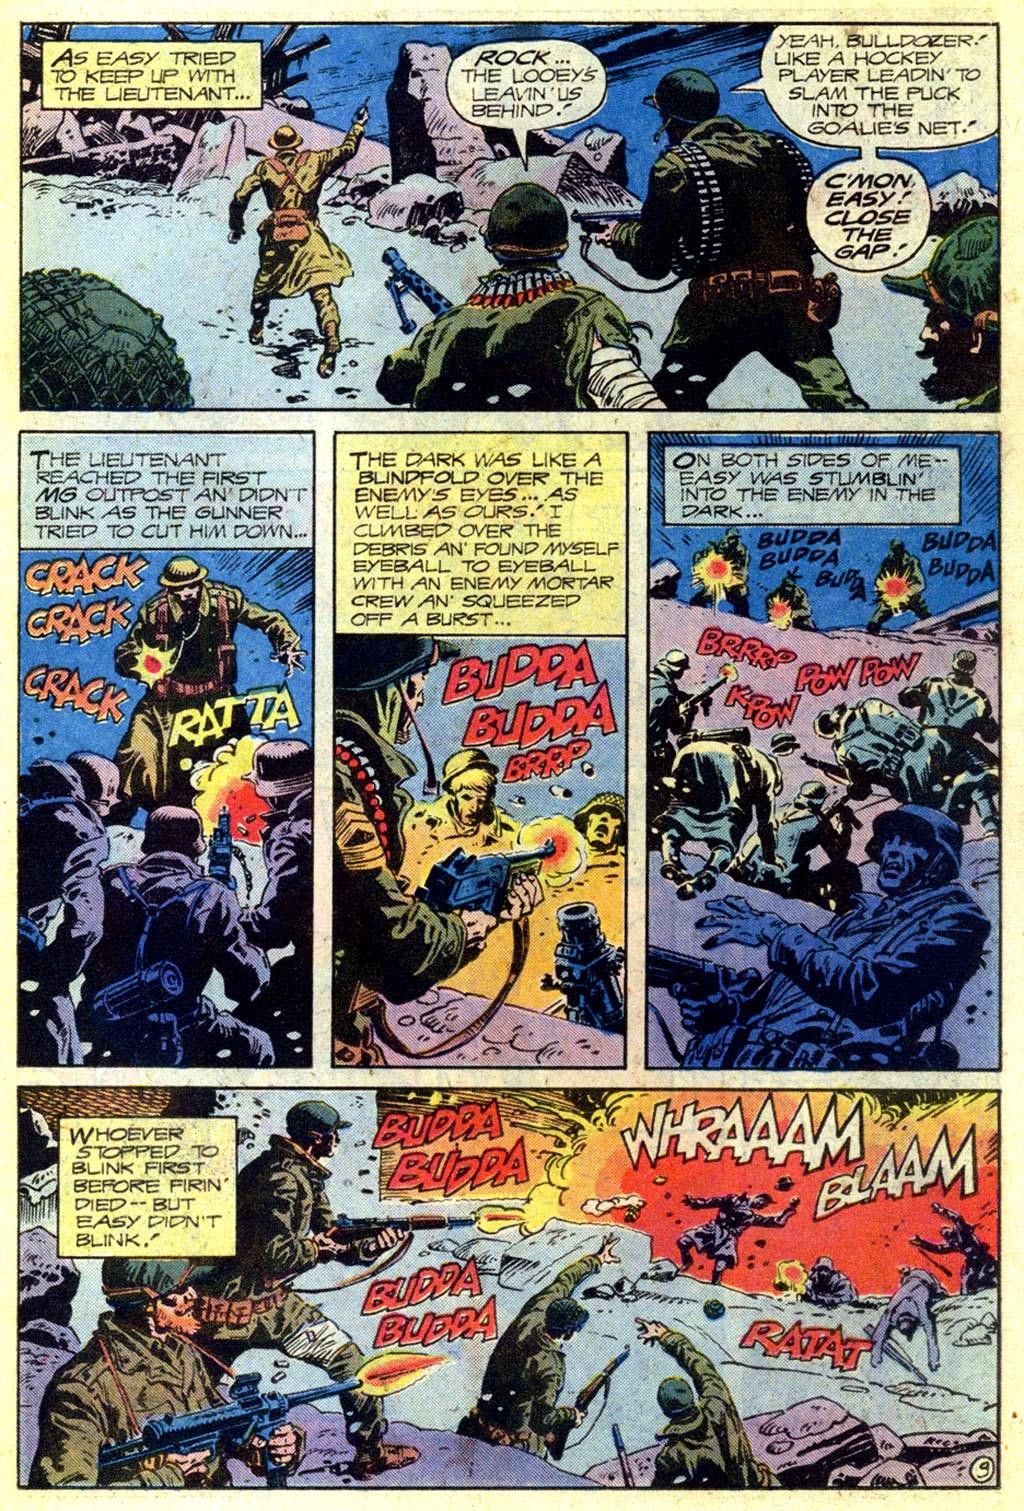 Read online Sgt. Rock comic -  Issue #336 - 10